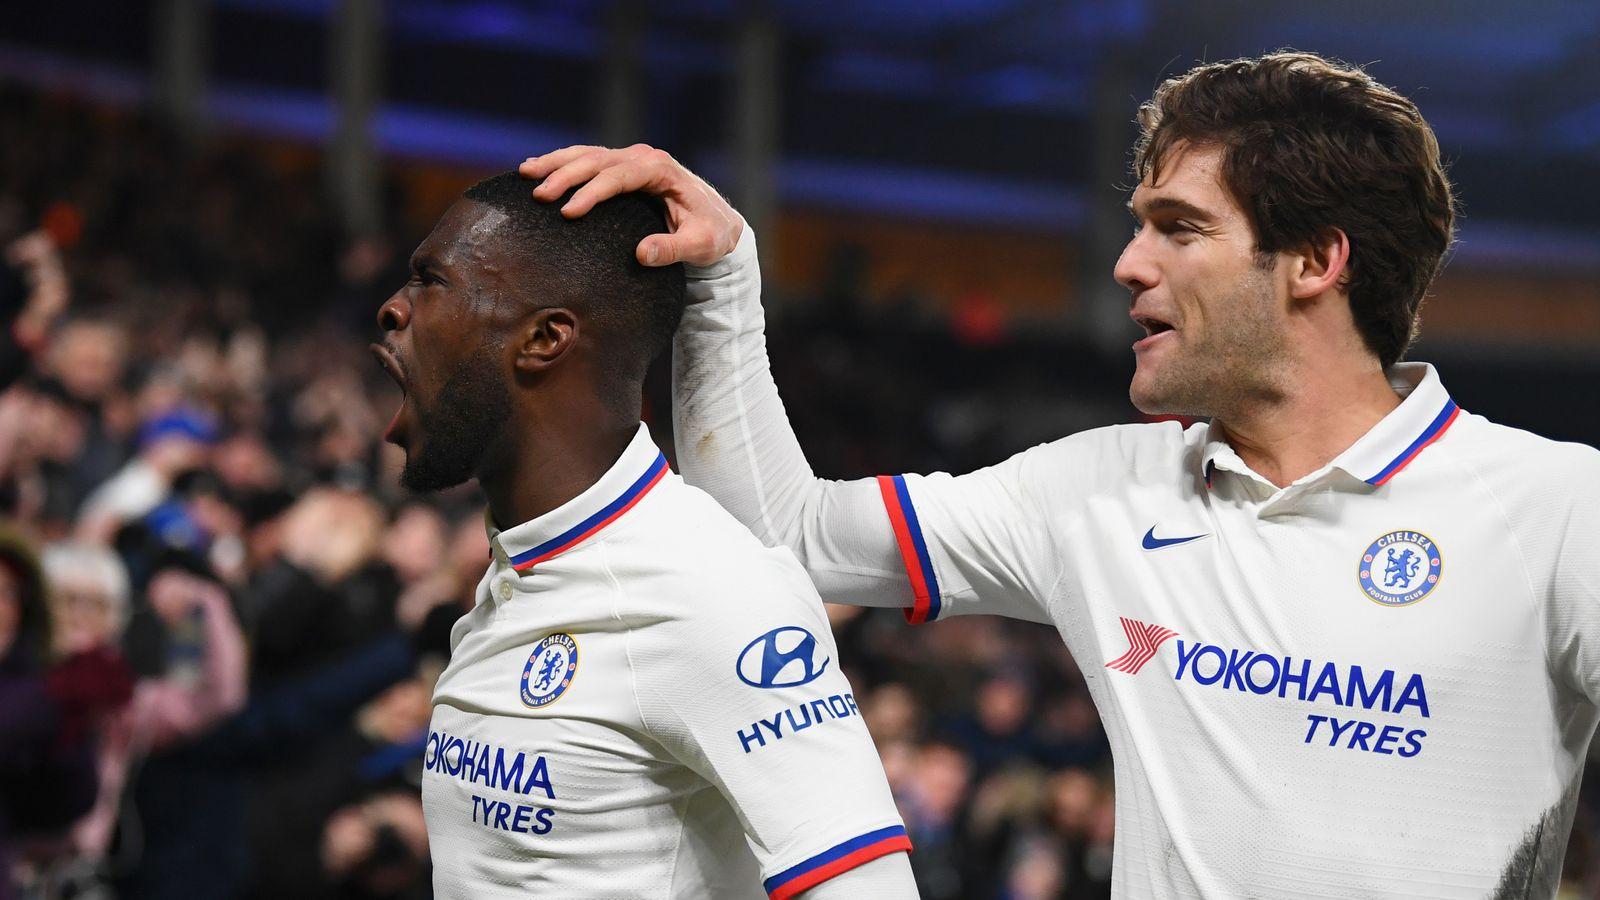 Tomori lifts lid on Lampard's Chelsea